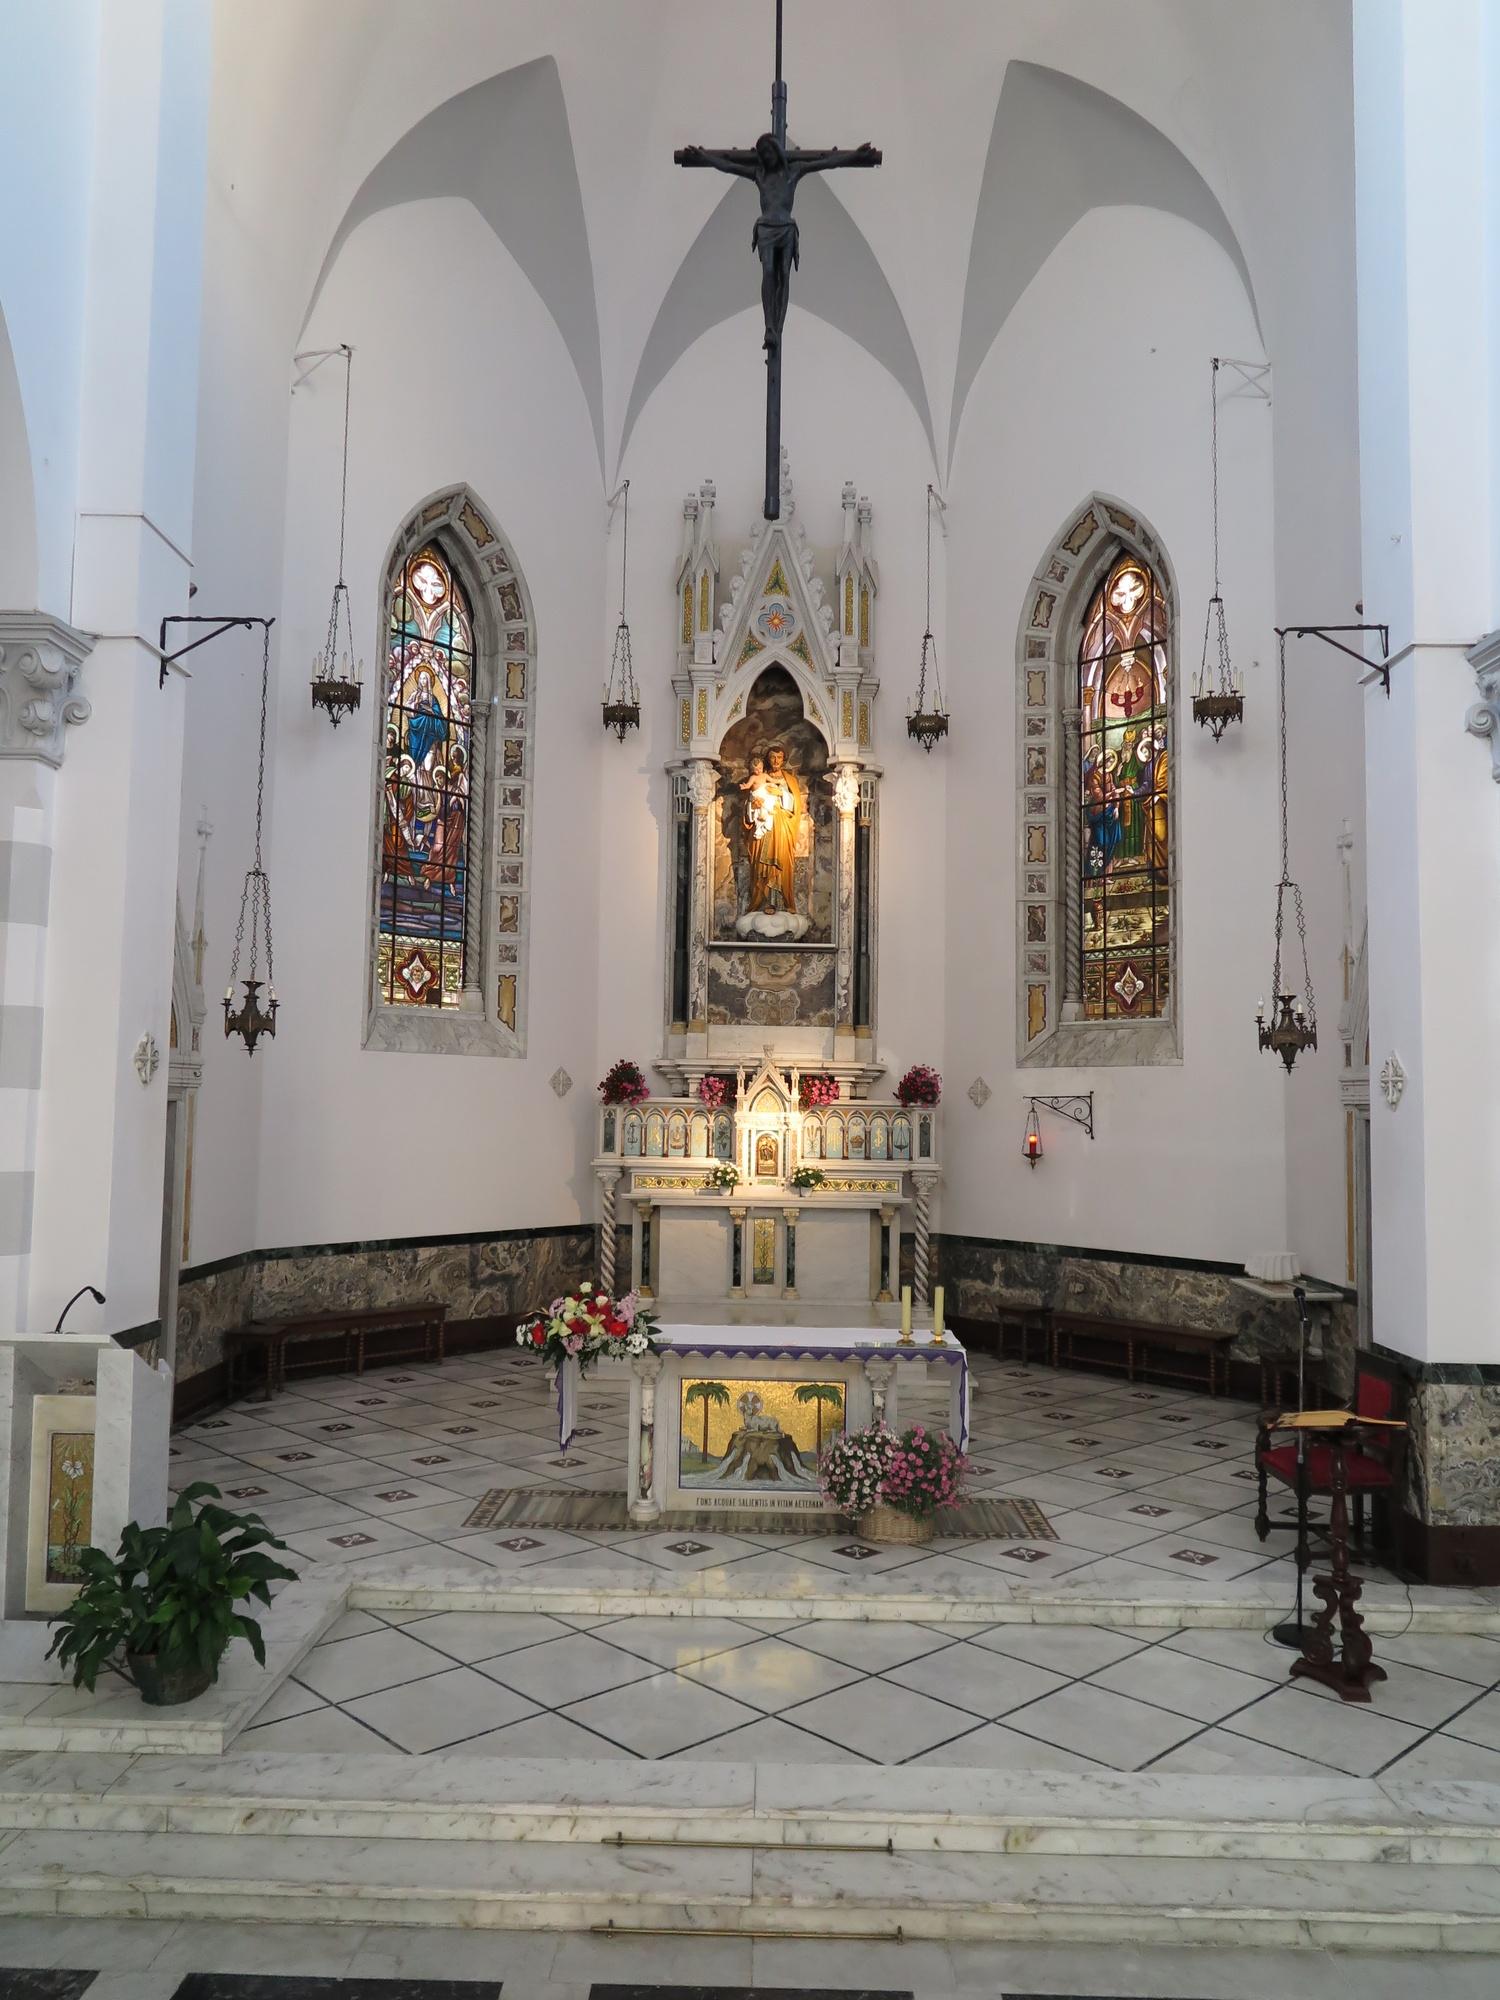 chiesa-san-giuseppe-2016-03-18-14-58-11